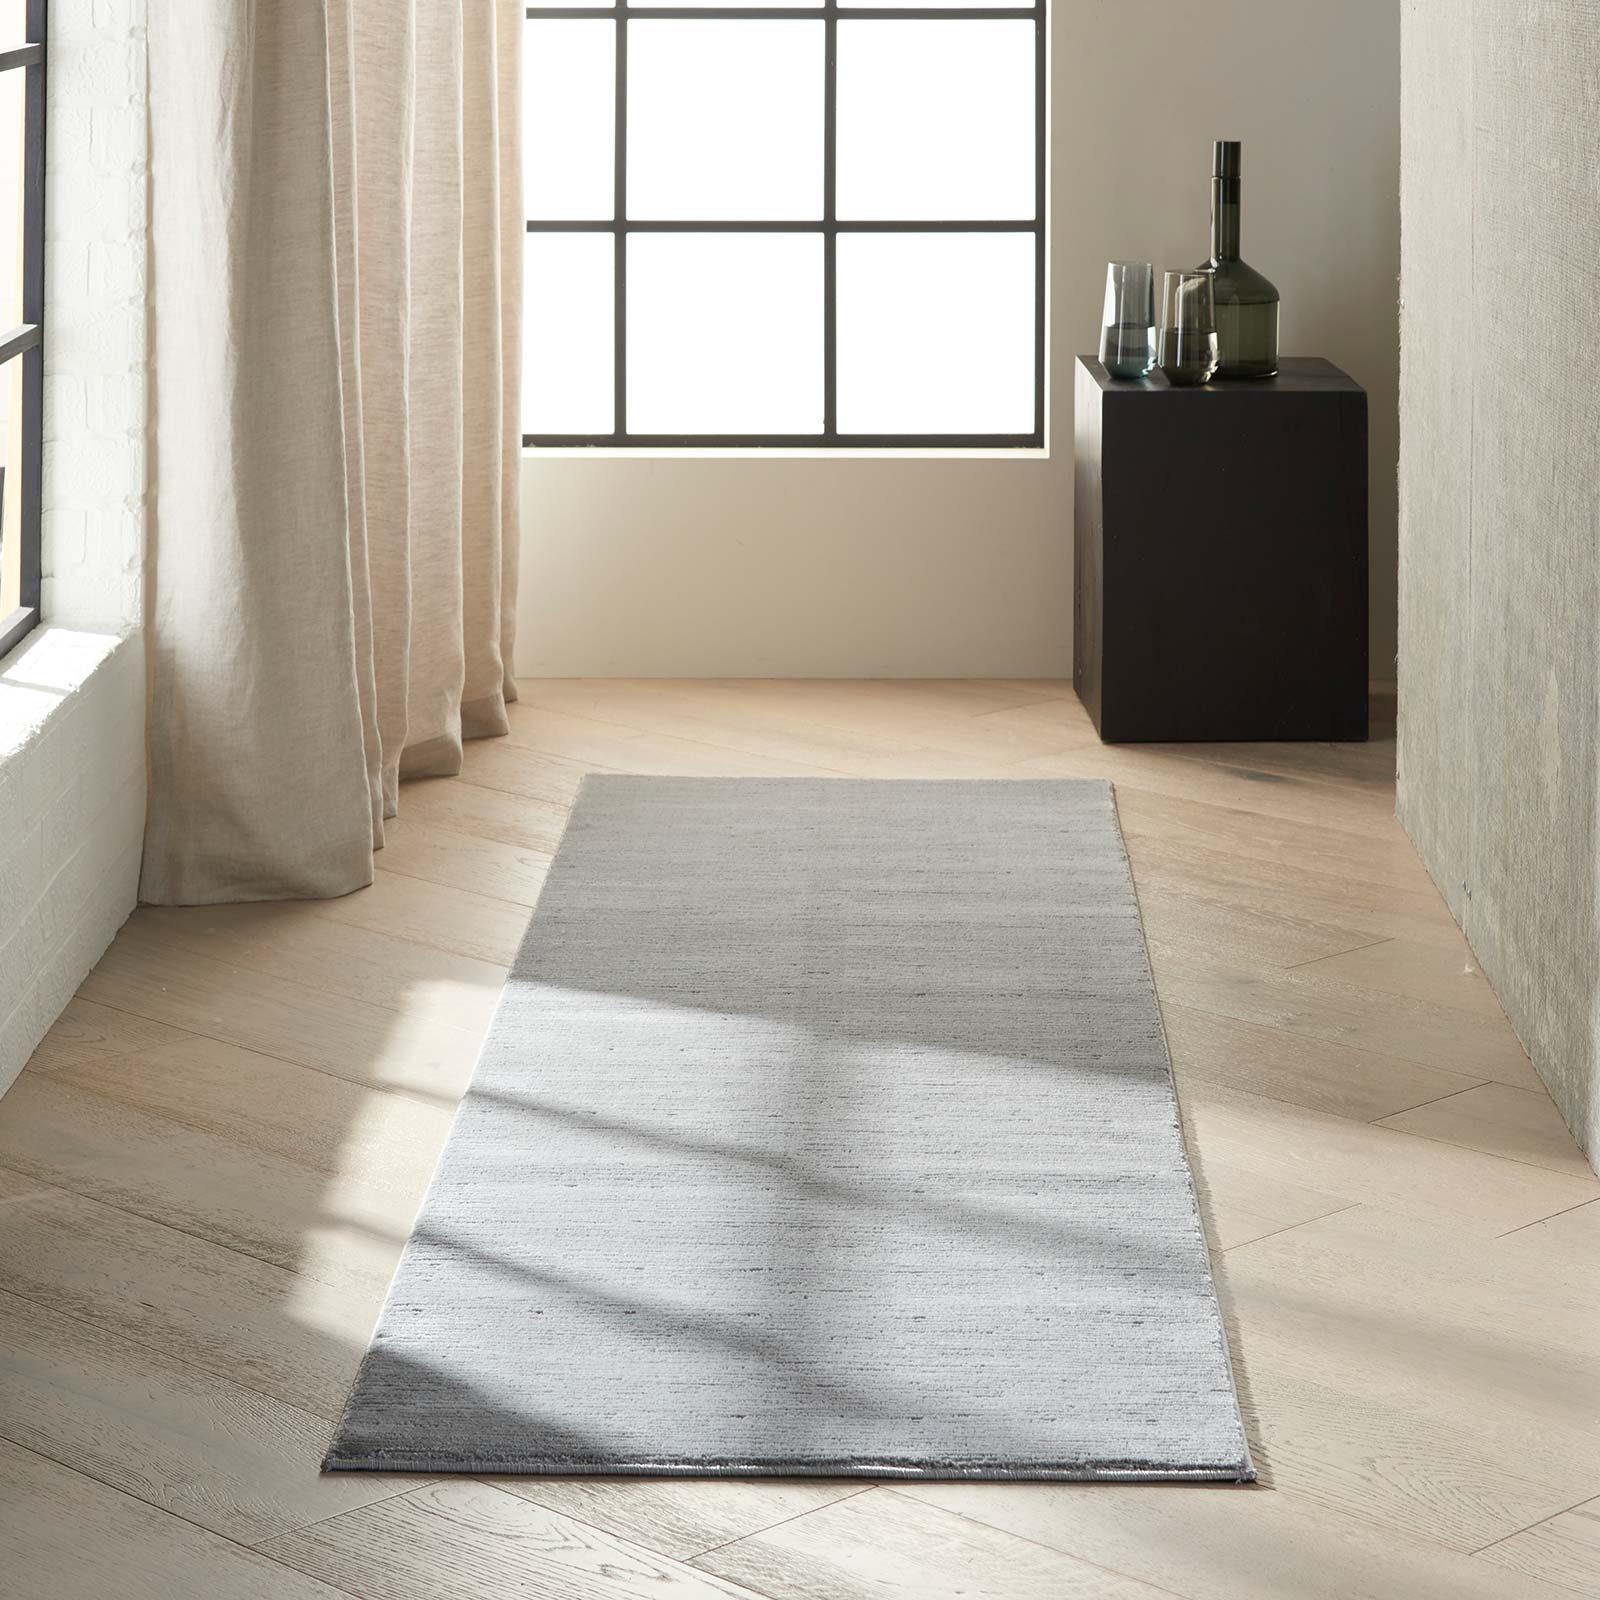 Calvin Klein rug Jackson CK780 CK781 GREY 2x8 099446356239 interior 1 C